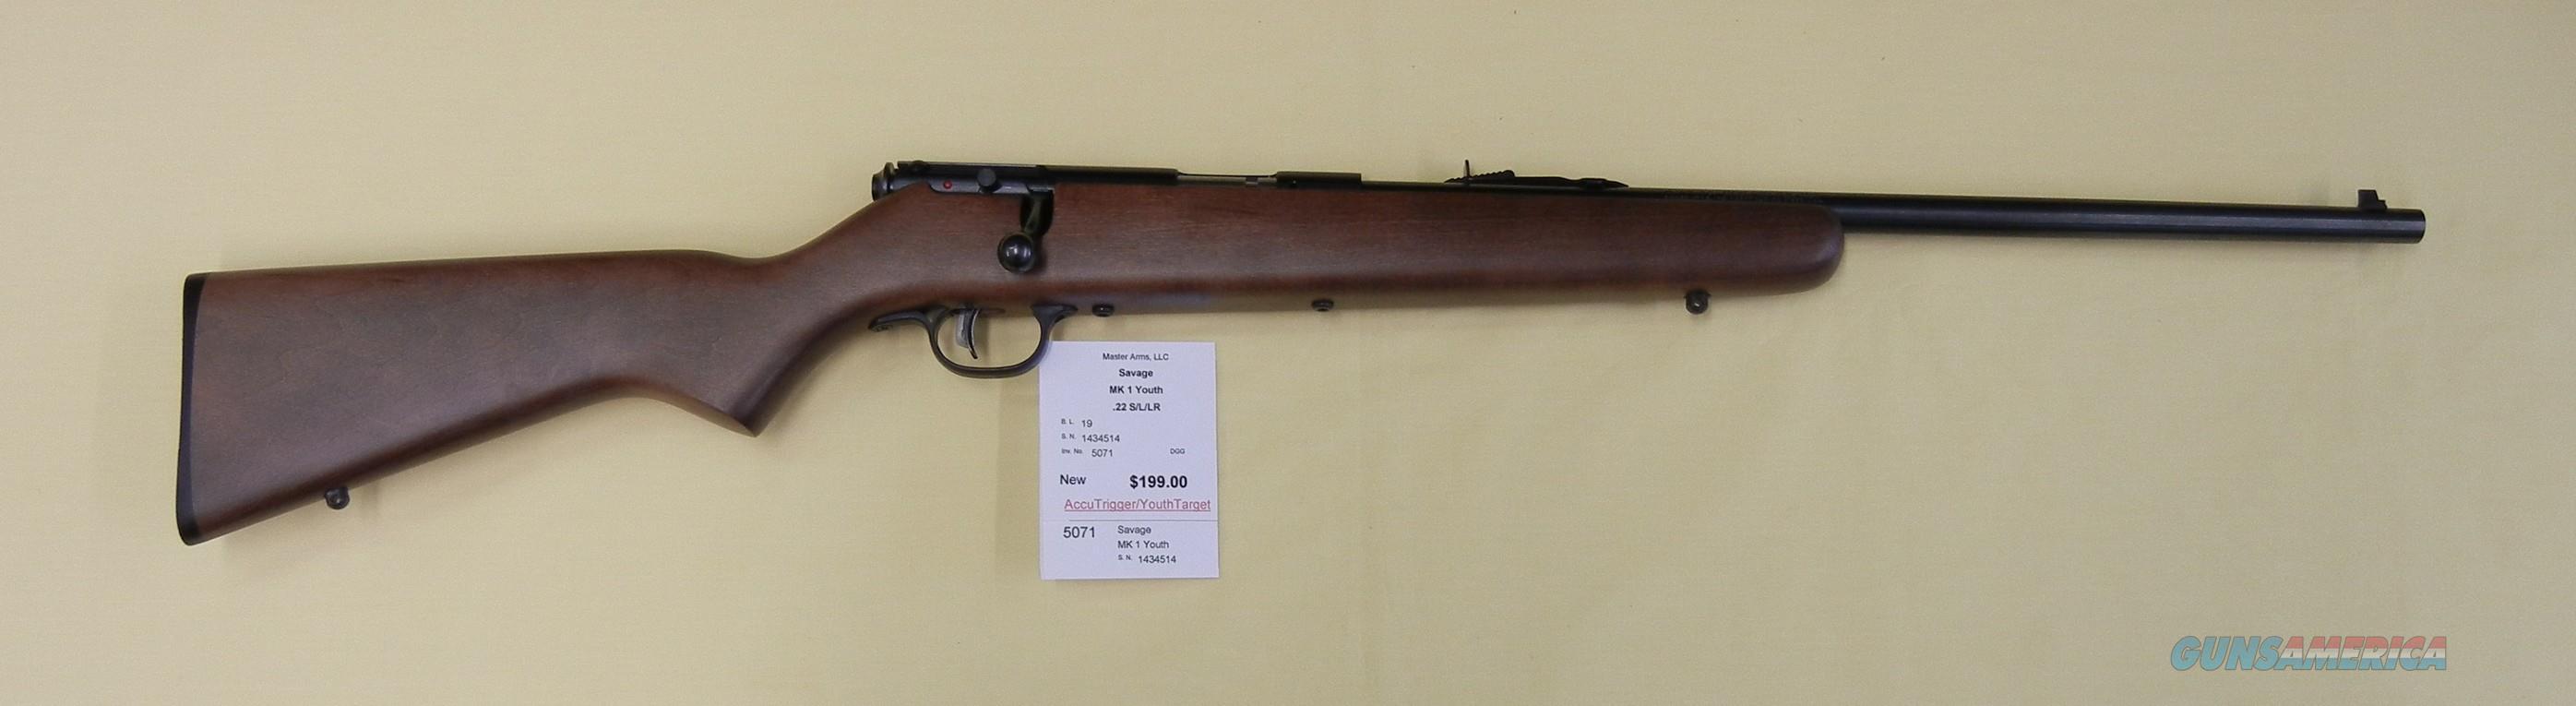 SAVAGE MK1 YOUTH  Guns > Rifles > Savage Rifles > Rimfire